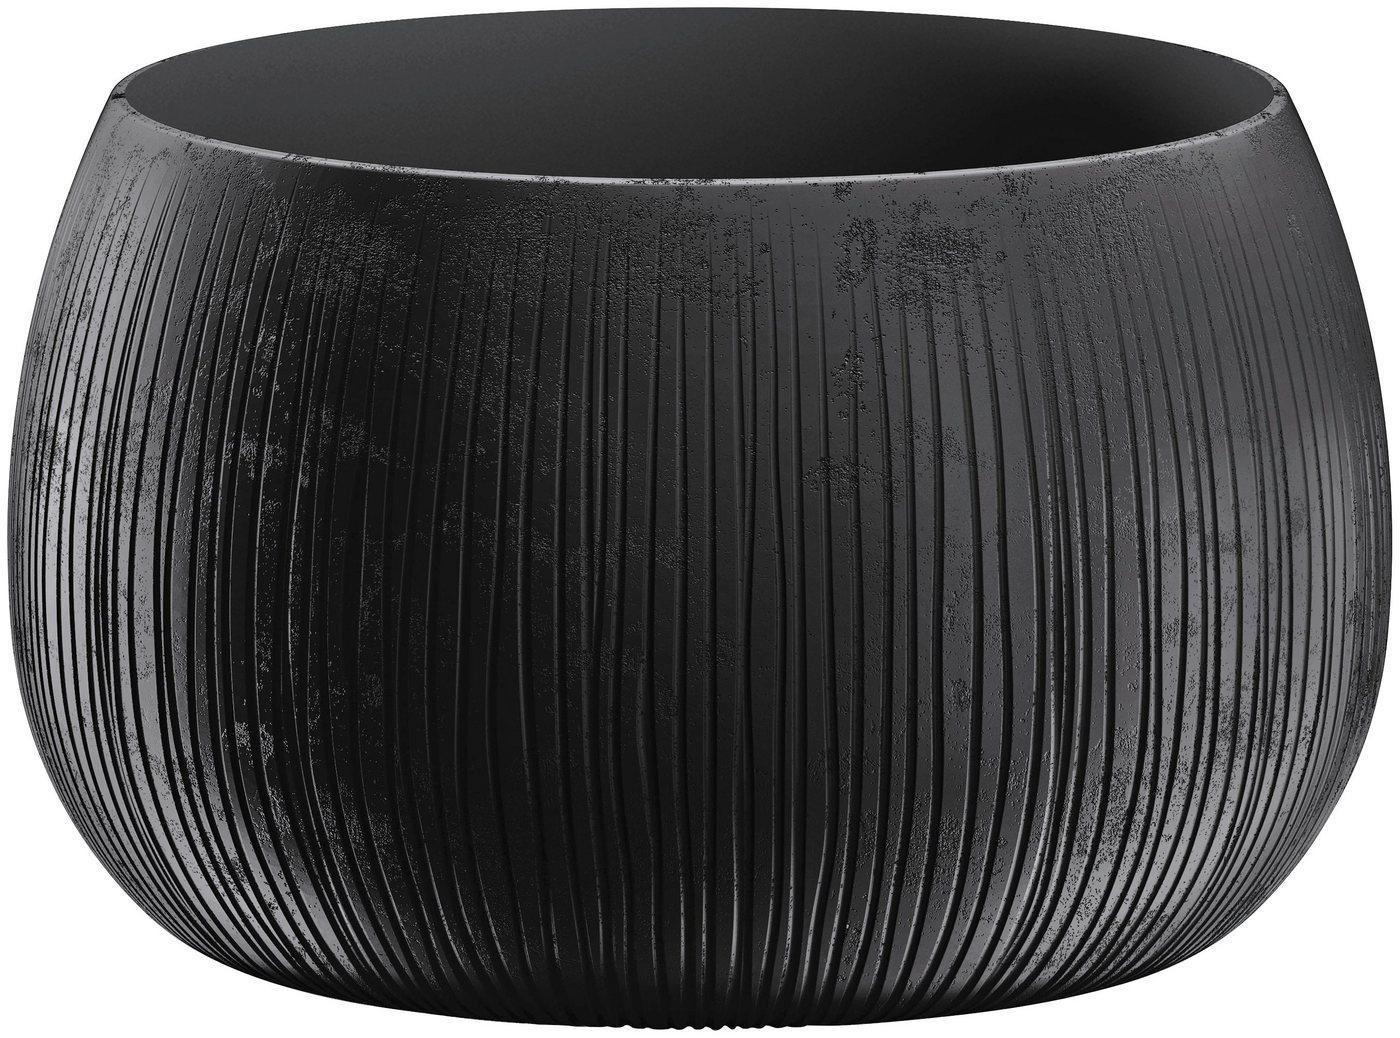 Prosperplast Blumentopf »Beton Bowl« (1 Stück), Ø48cm x 30cm